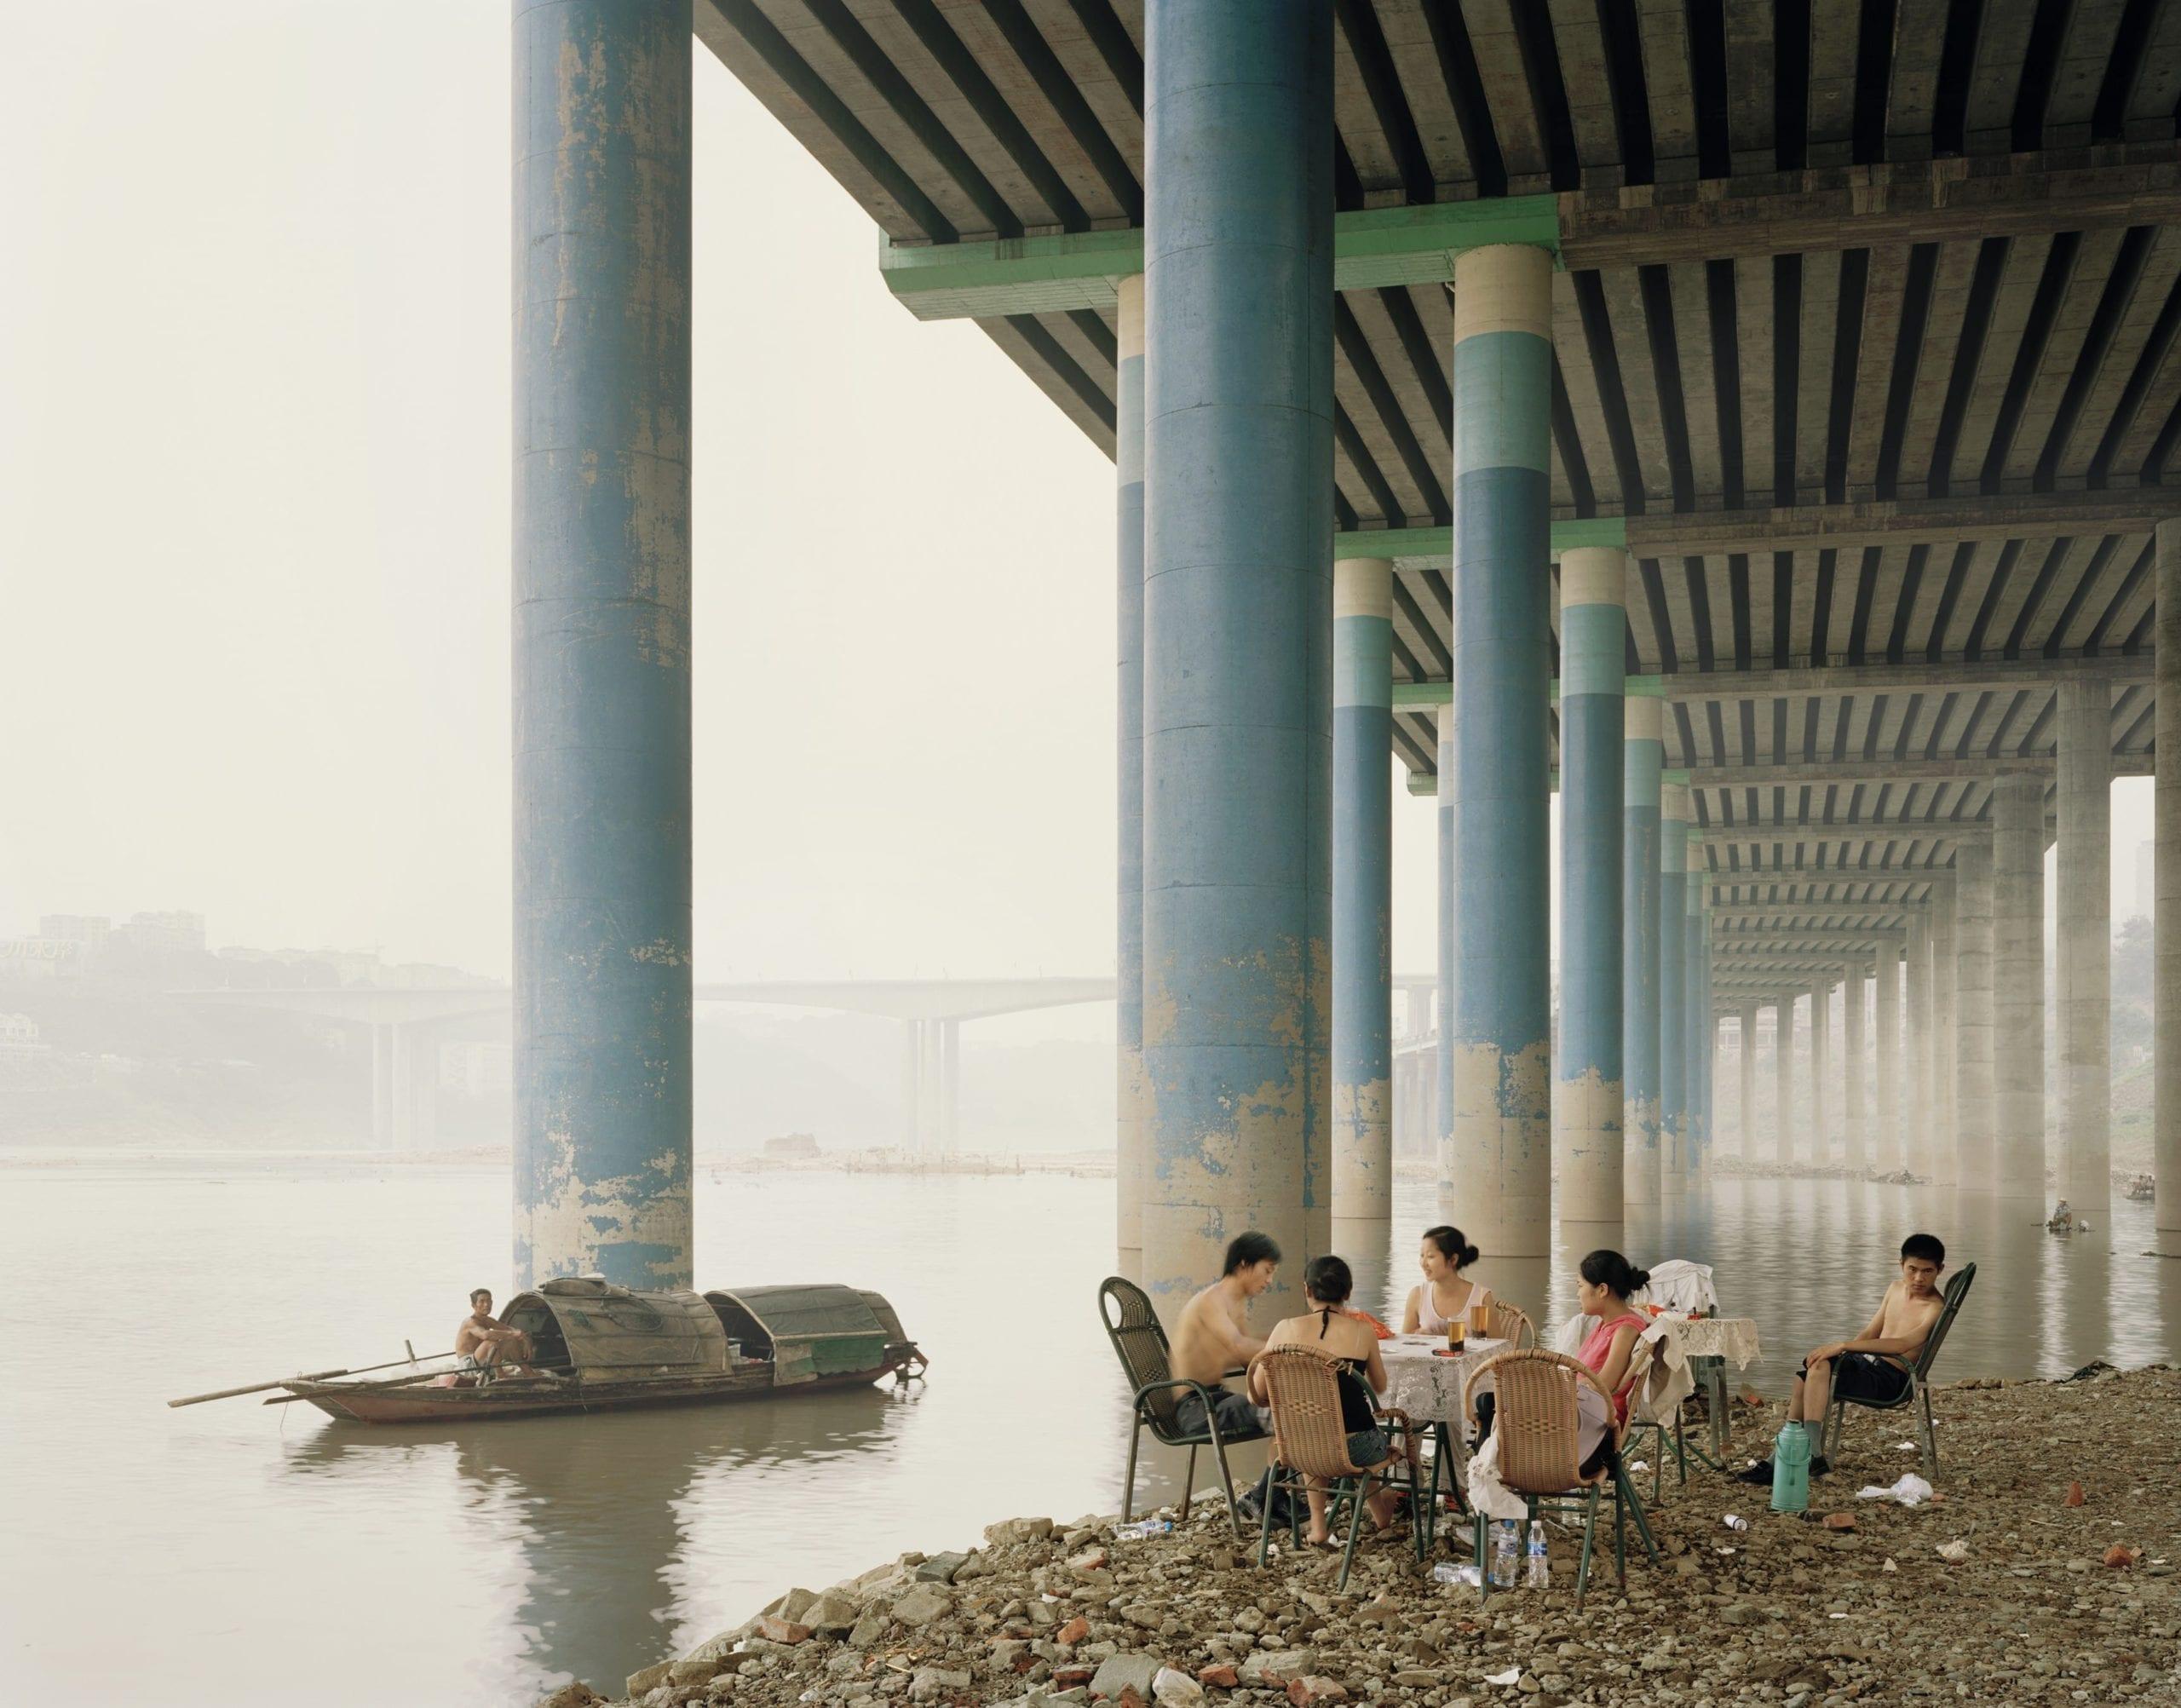 Chongqing IV (Sunday Picnic), Chongqing Municipality, 2006 © Nadav Kander